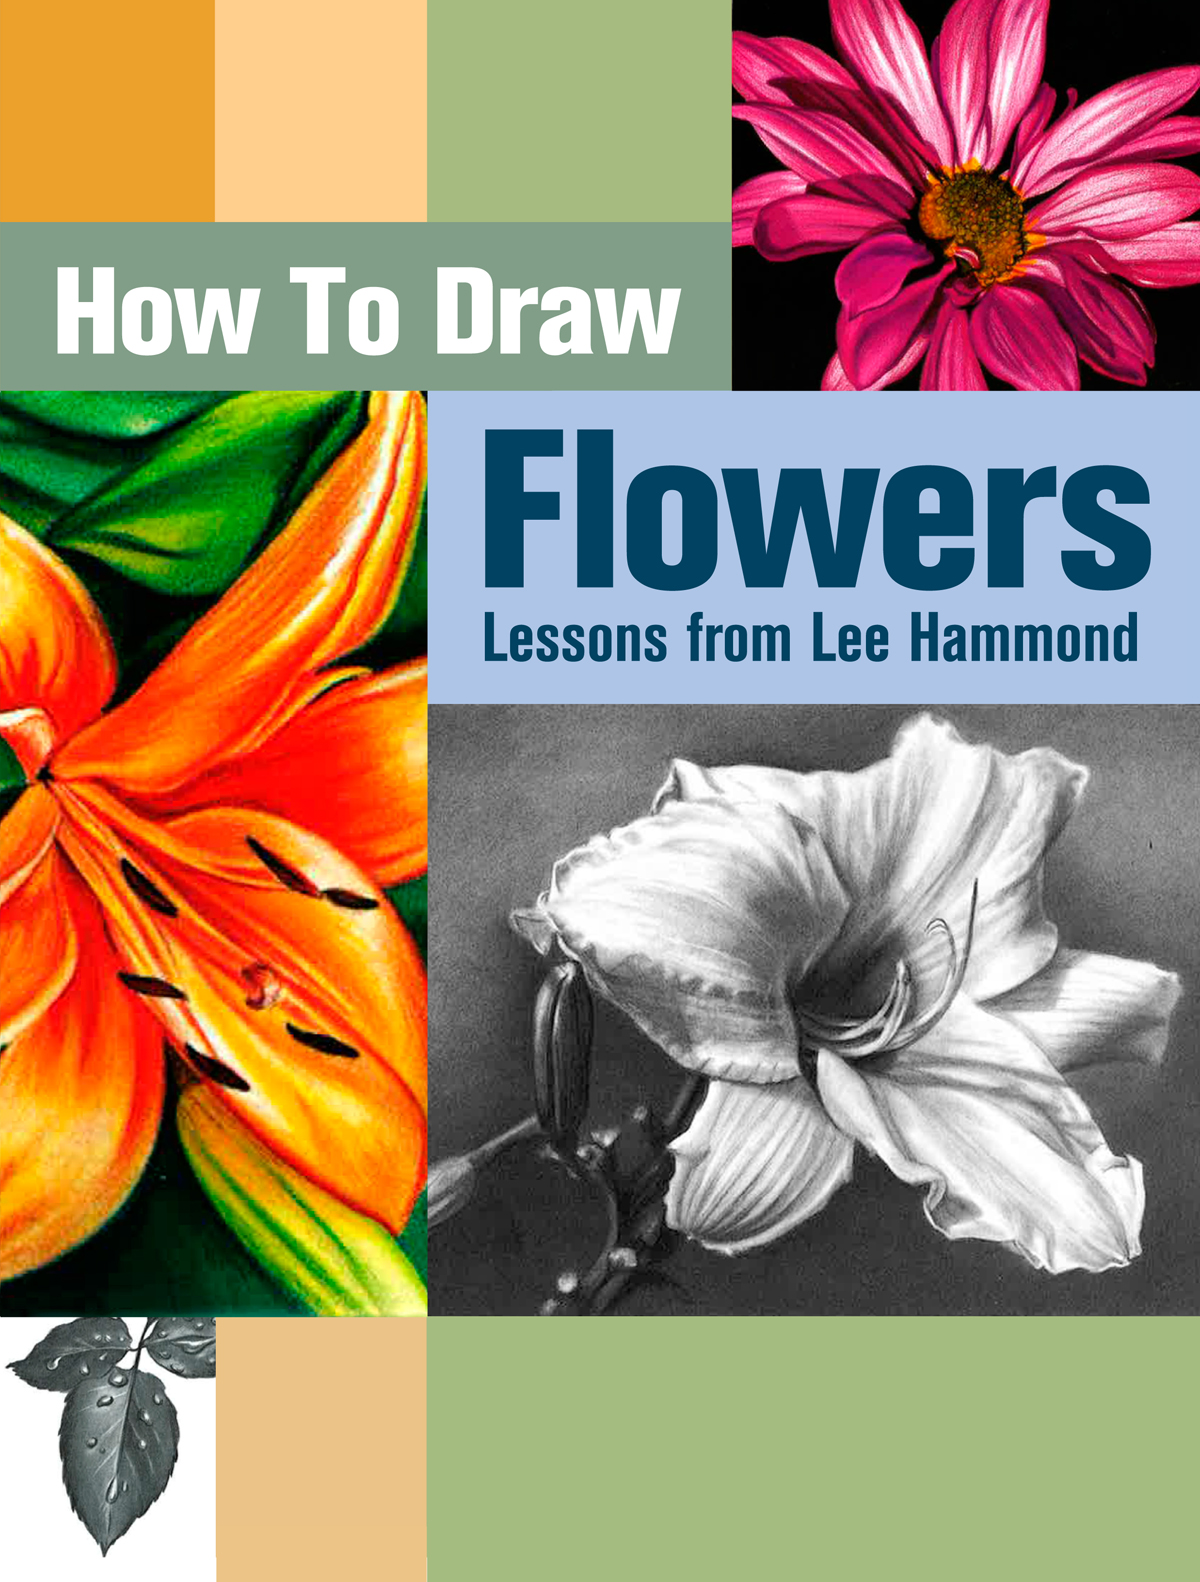 Drawn still life pdf How & FREE Draw Flowers